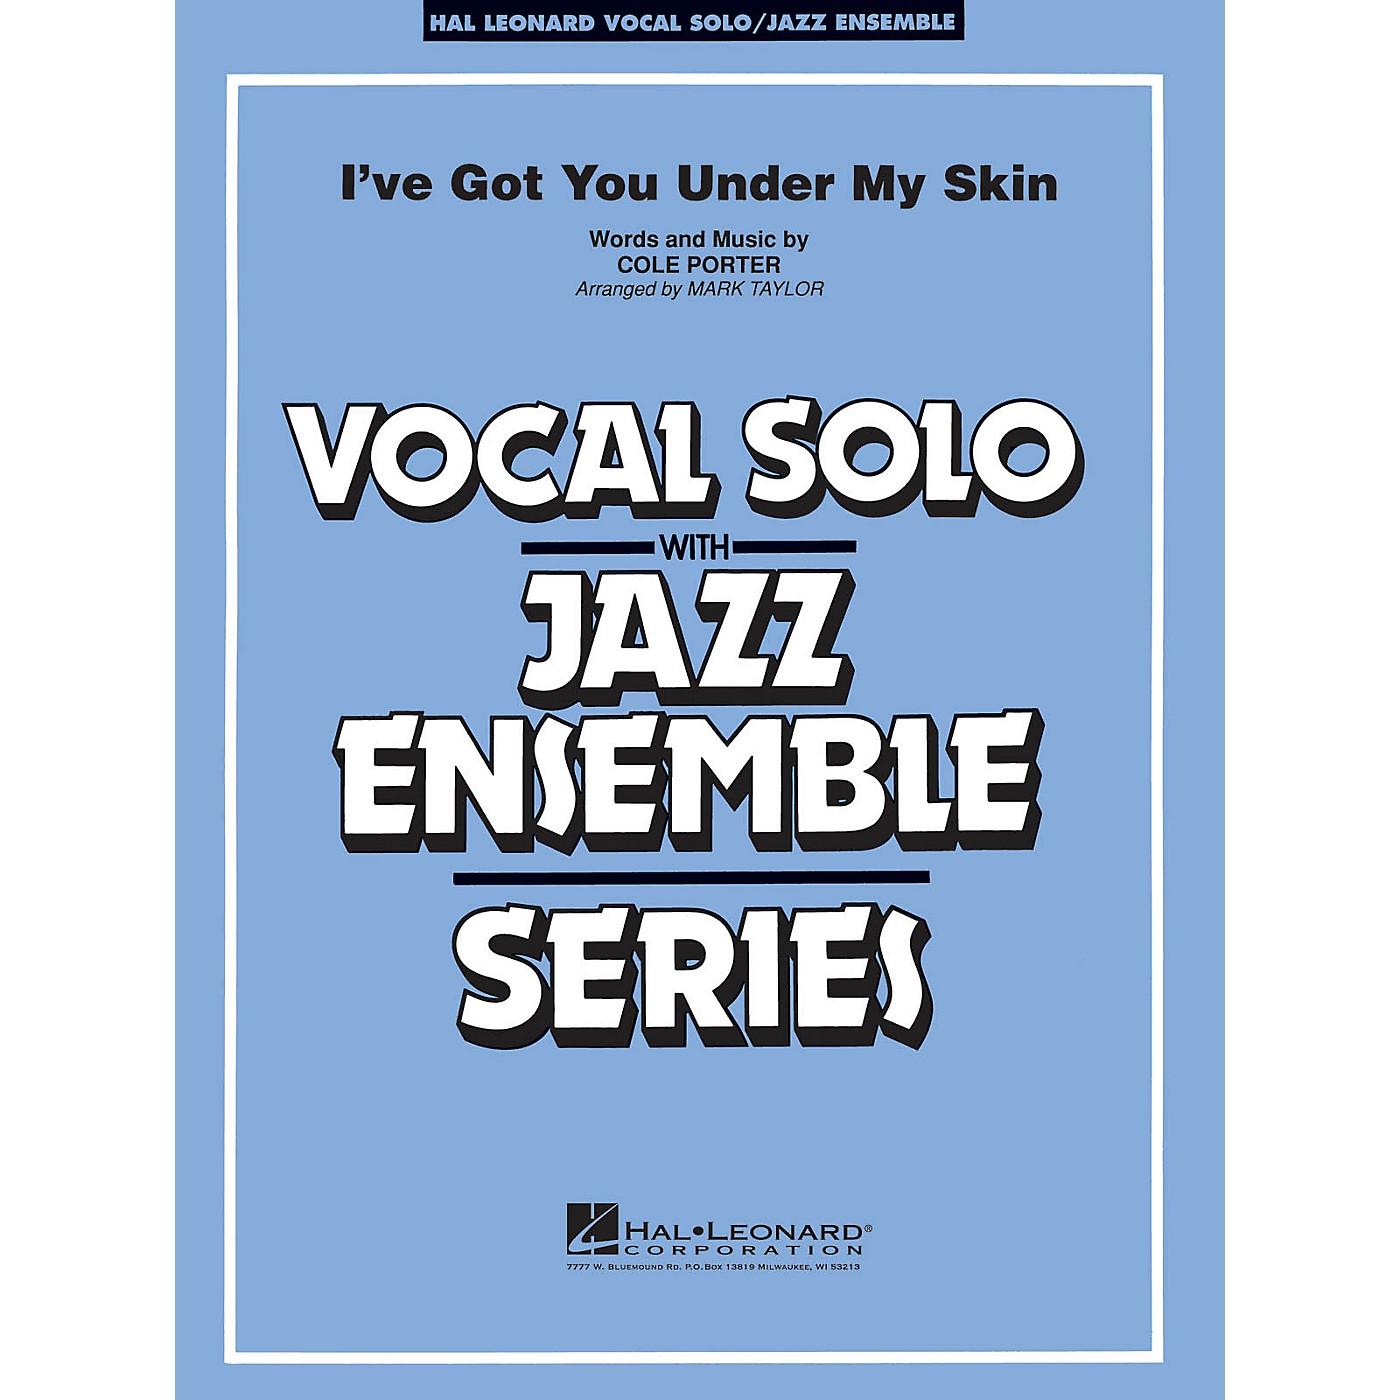 Hal Leonard I've Got You Under My Skin (Key: C) Jazz Band Level 3-4 Composed by Cole Porter thumbnail